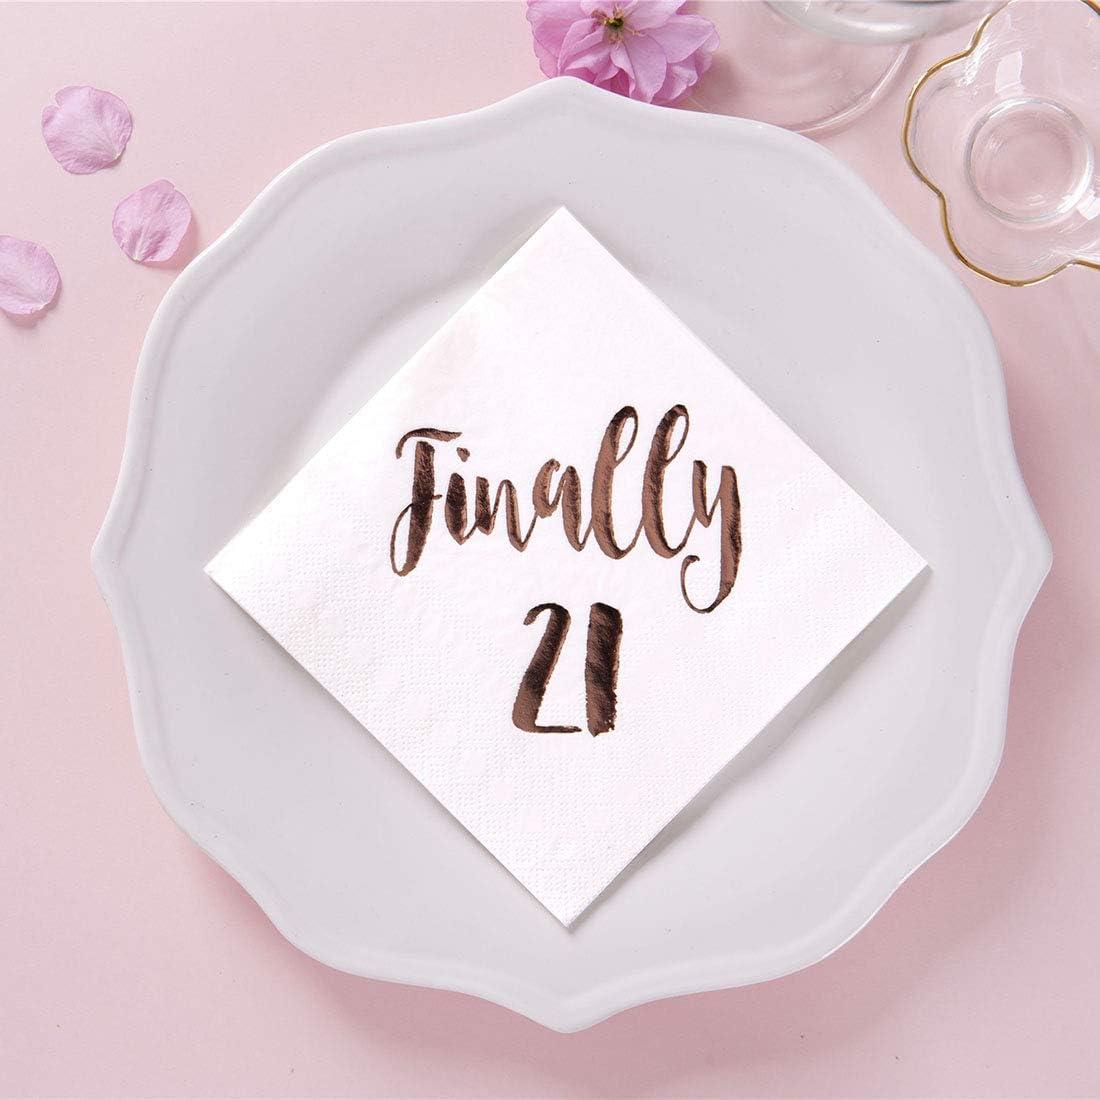 Amazon Com Magjuche Finally 21 Cocktail Napkins 50 Pack 3ply White Rose Gold 21st Birthday Dinner Celebration Party Decoration Napkin Home Kitchen